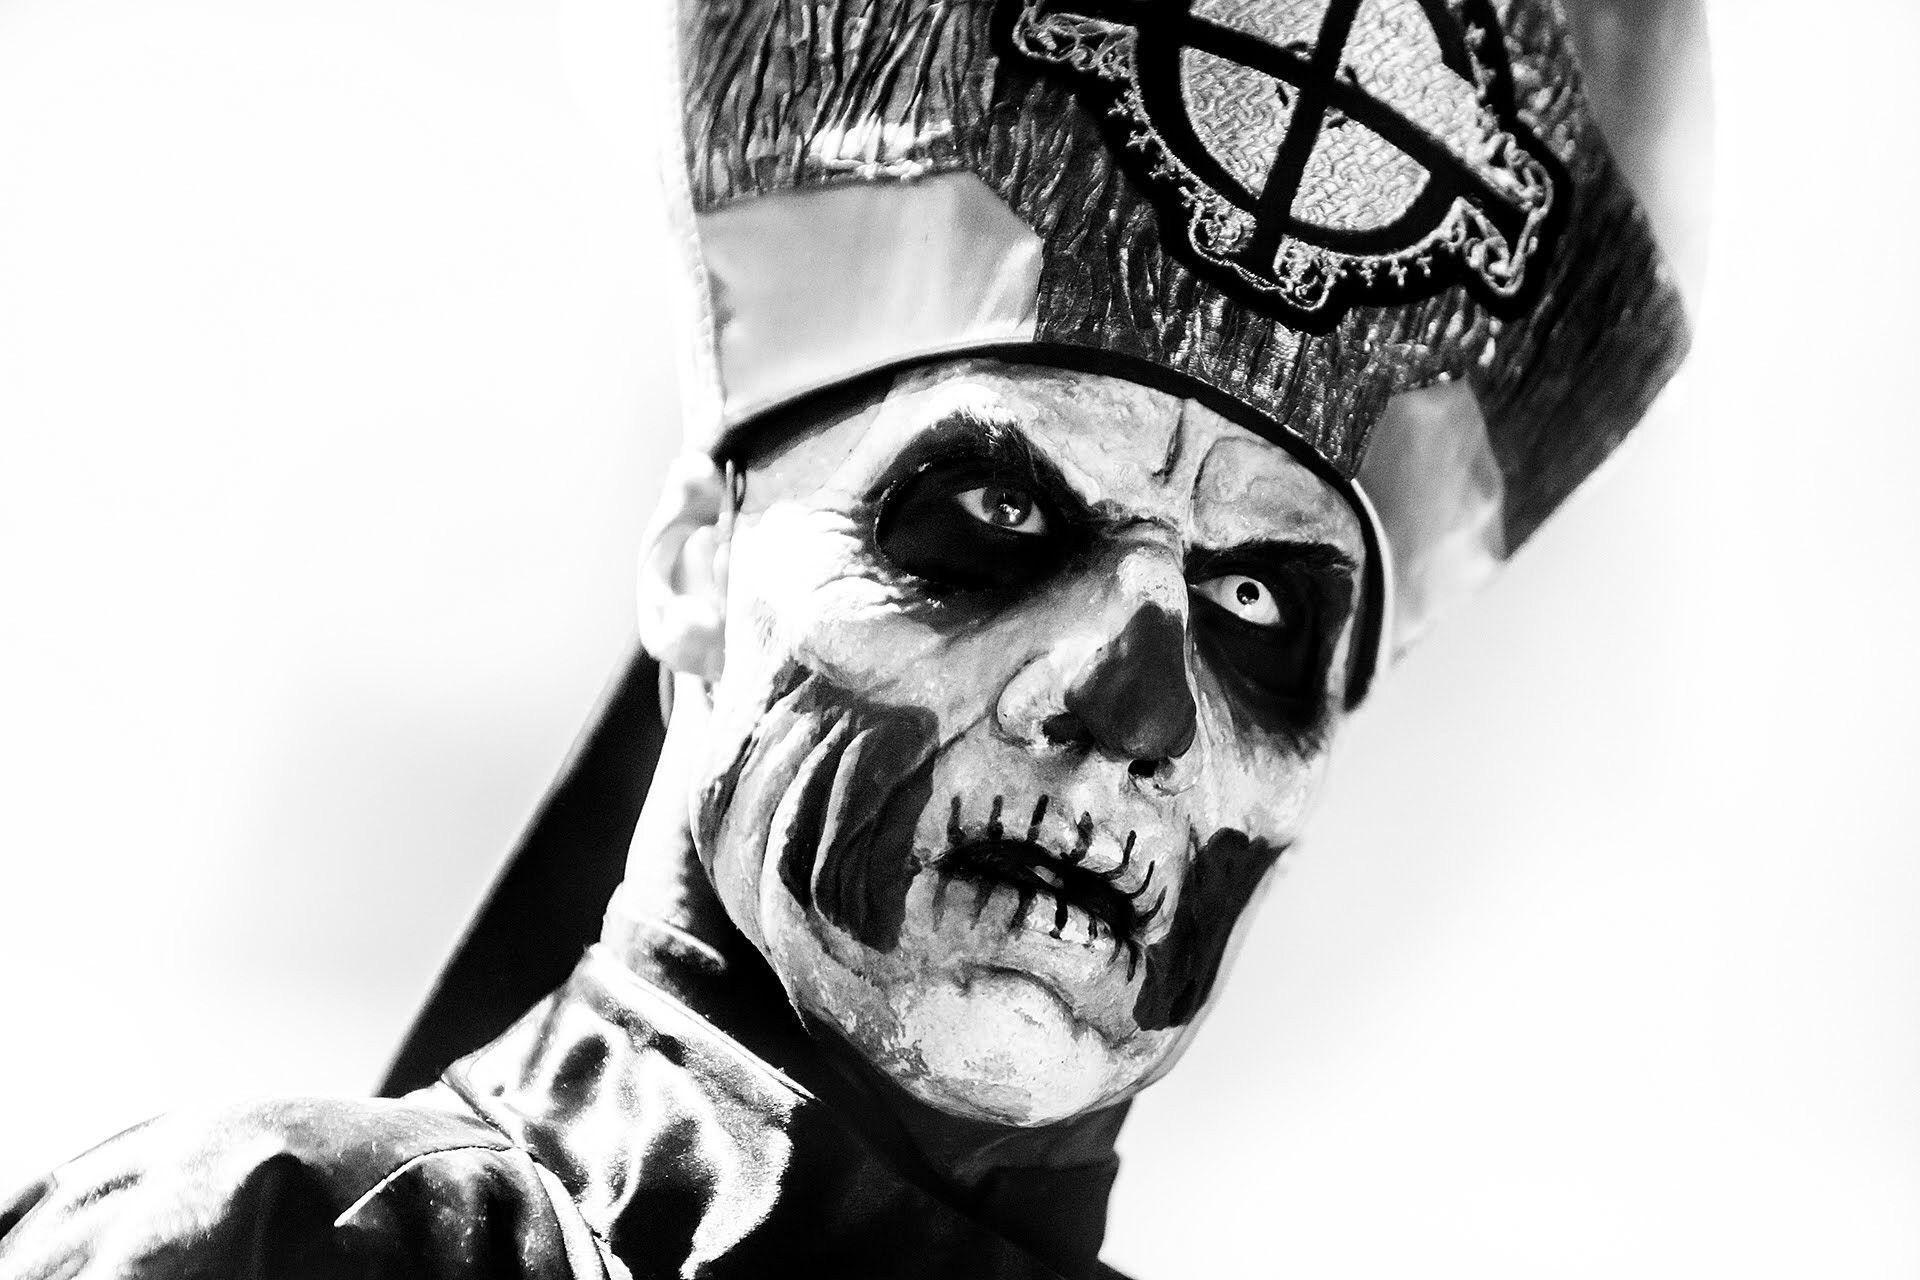 Metal Band Skull Paint